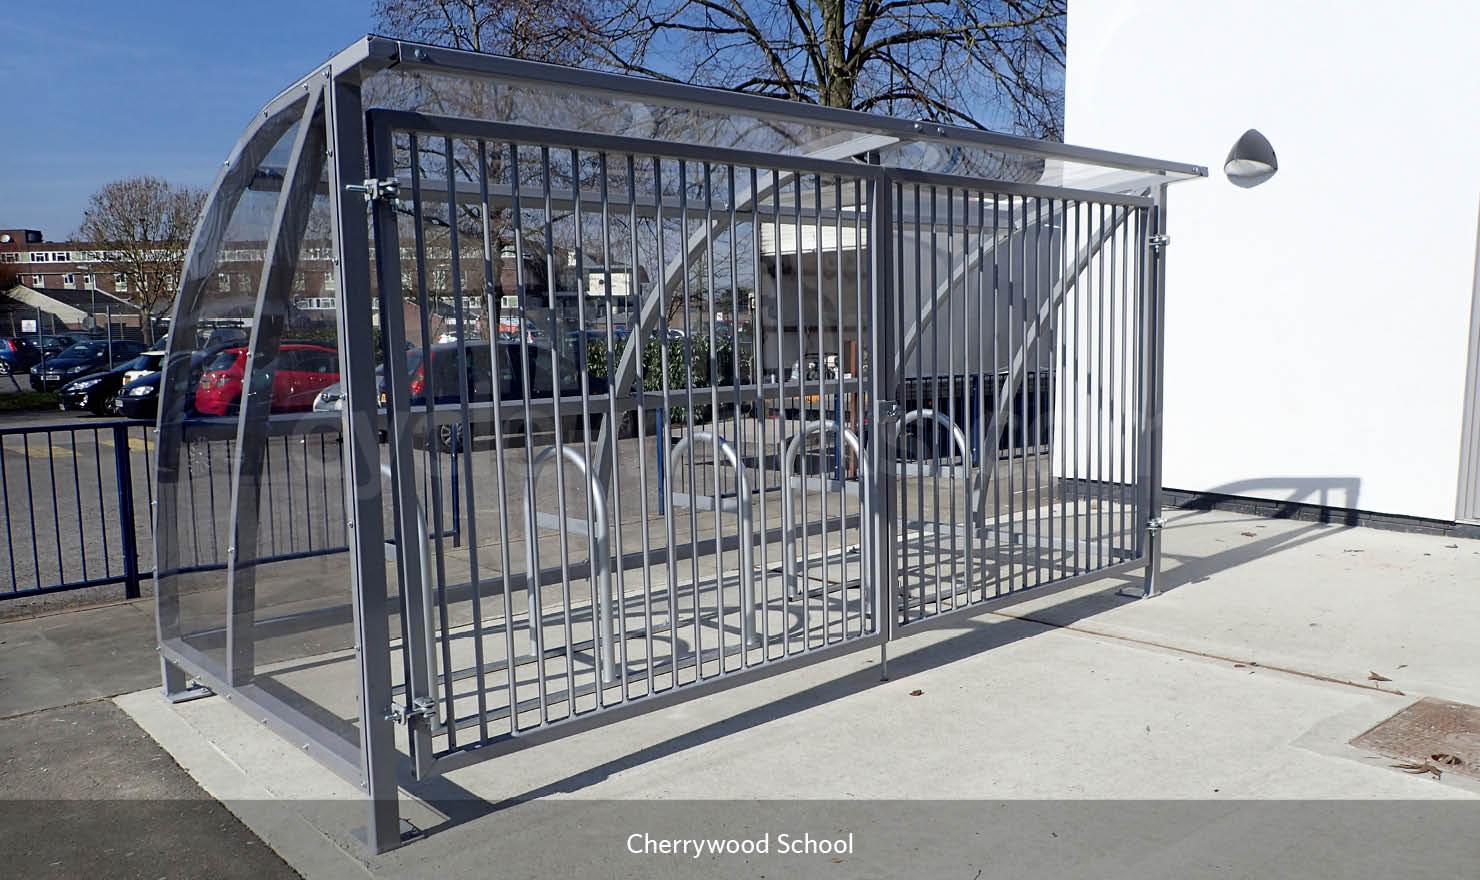 Solent Bike Shelter at Cherrywood Primary School